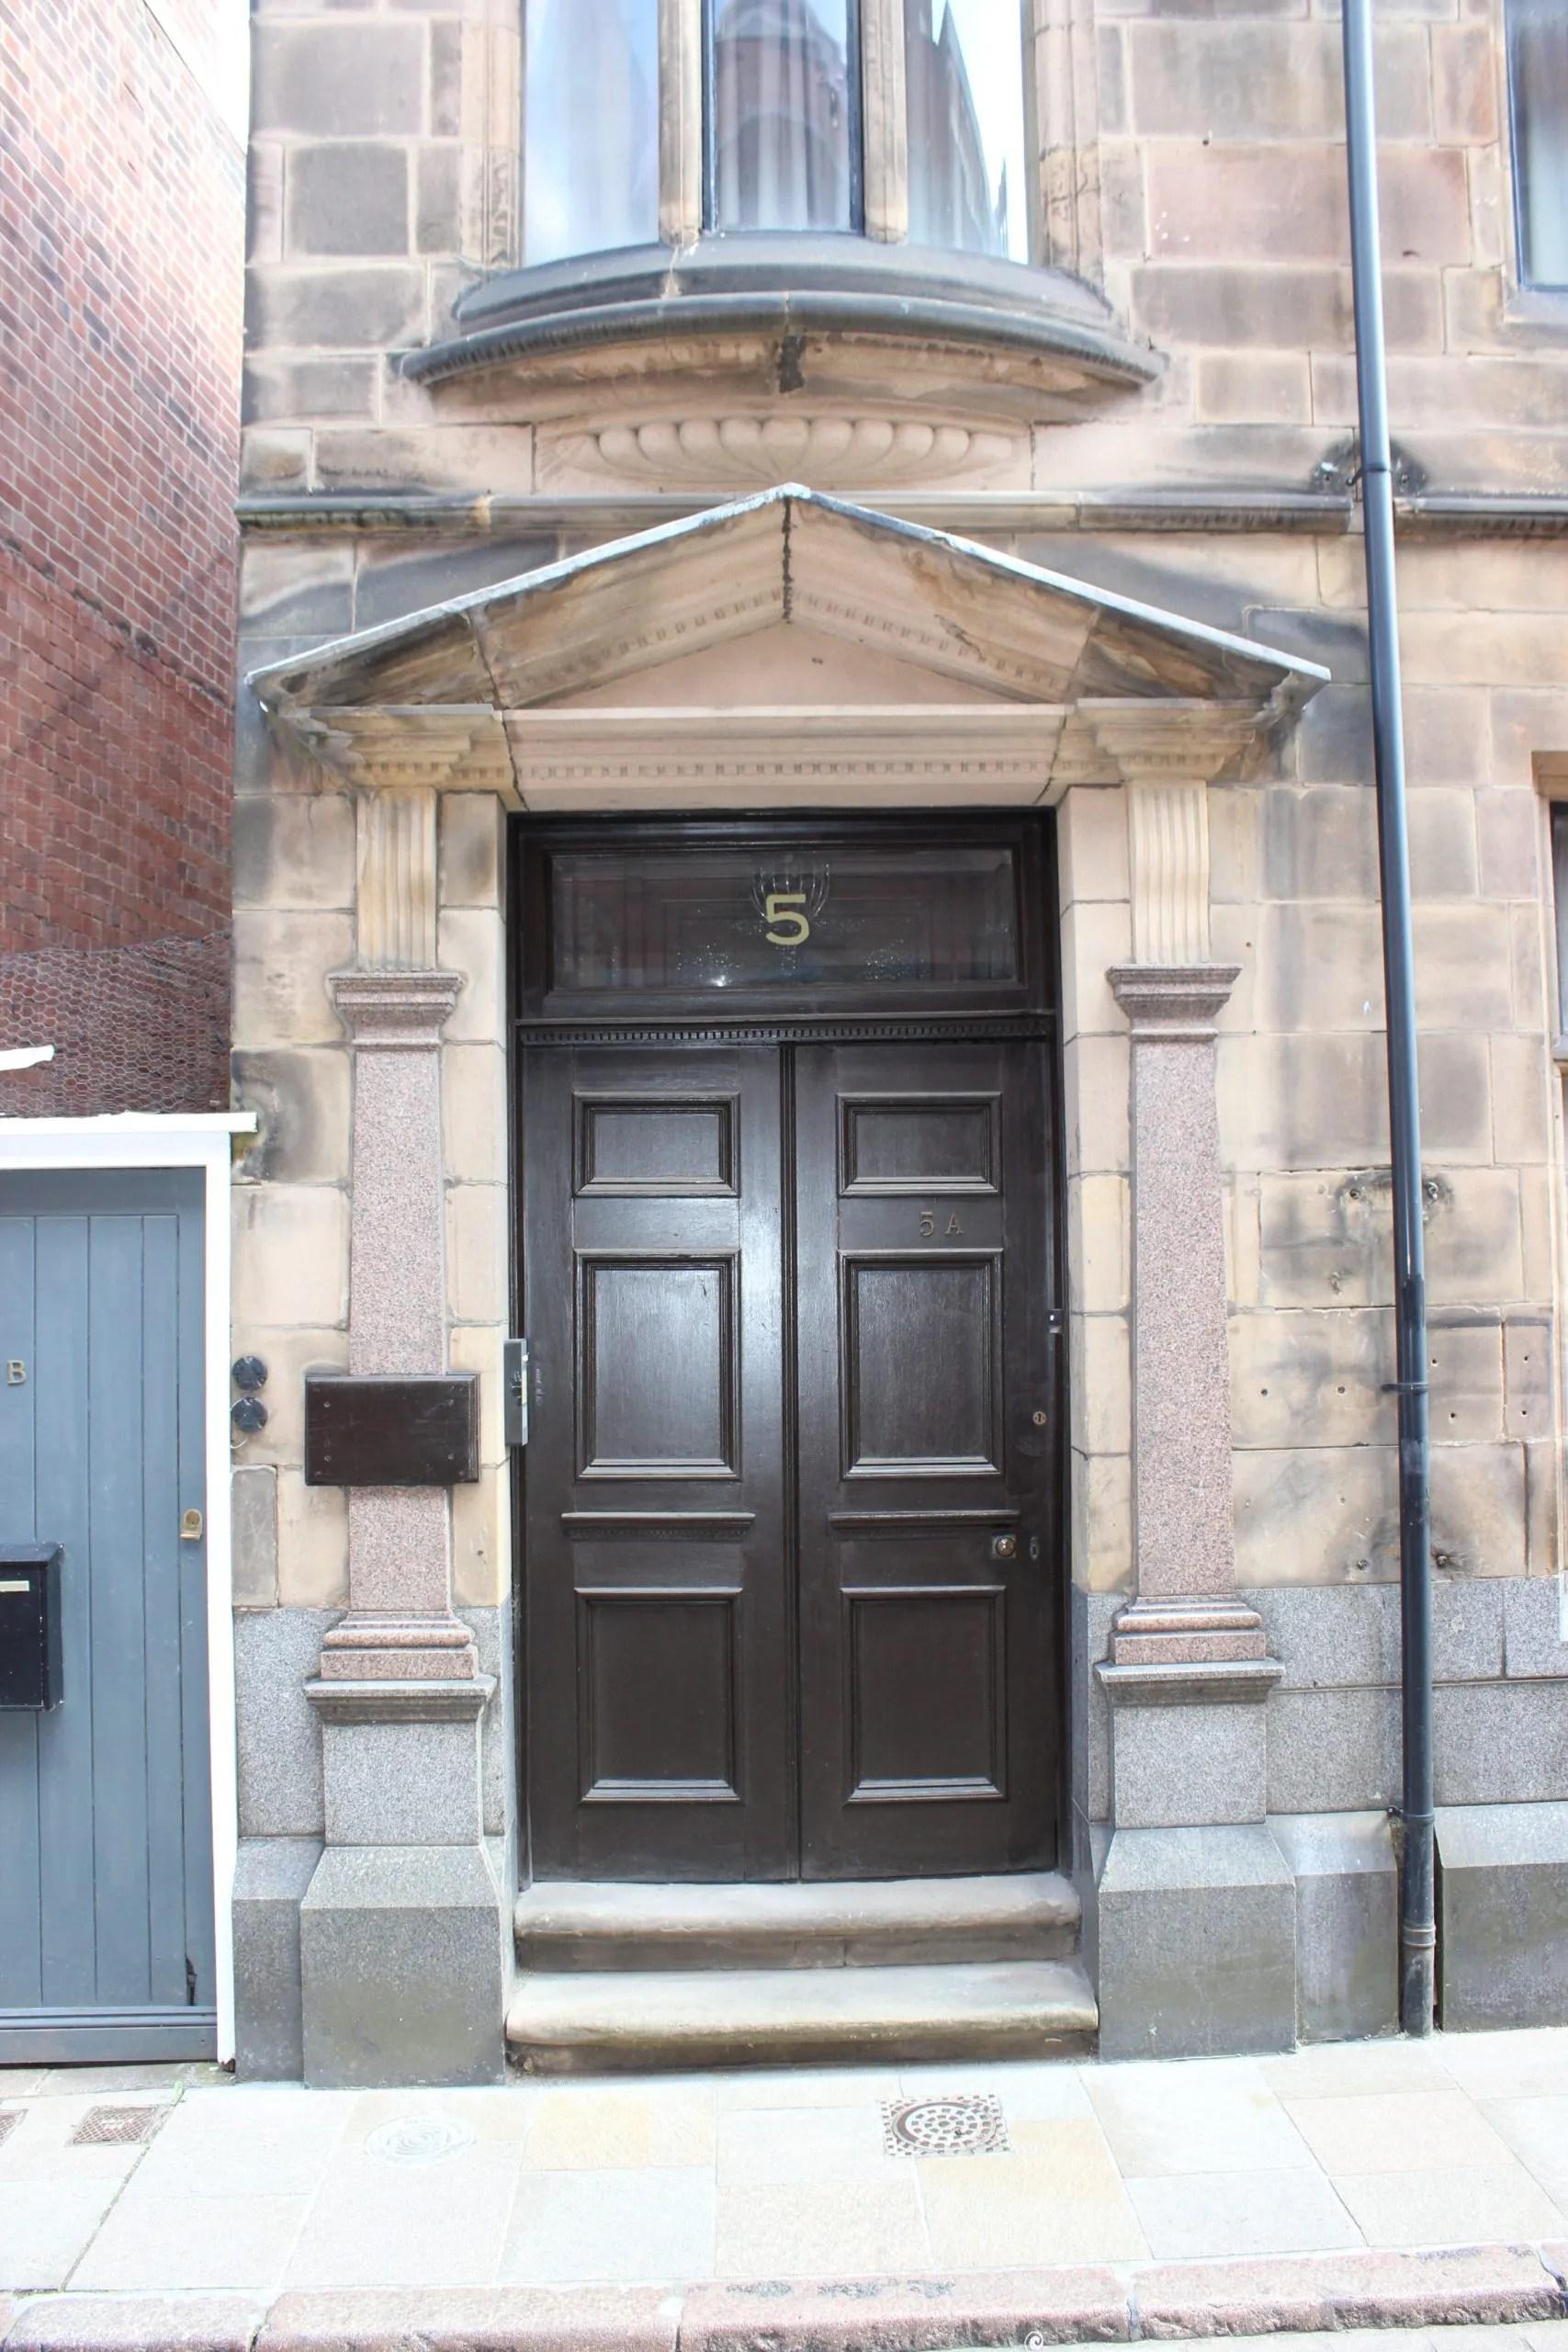 5 Friar Lane doorway after restoration